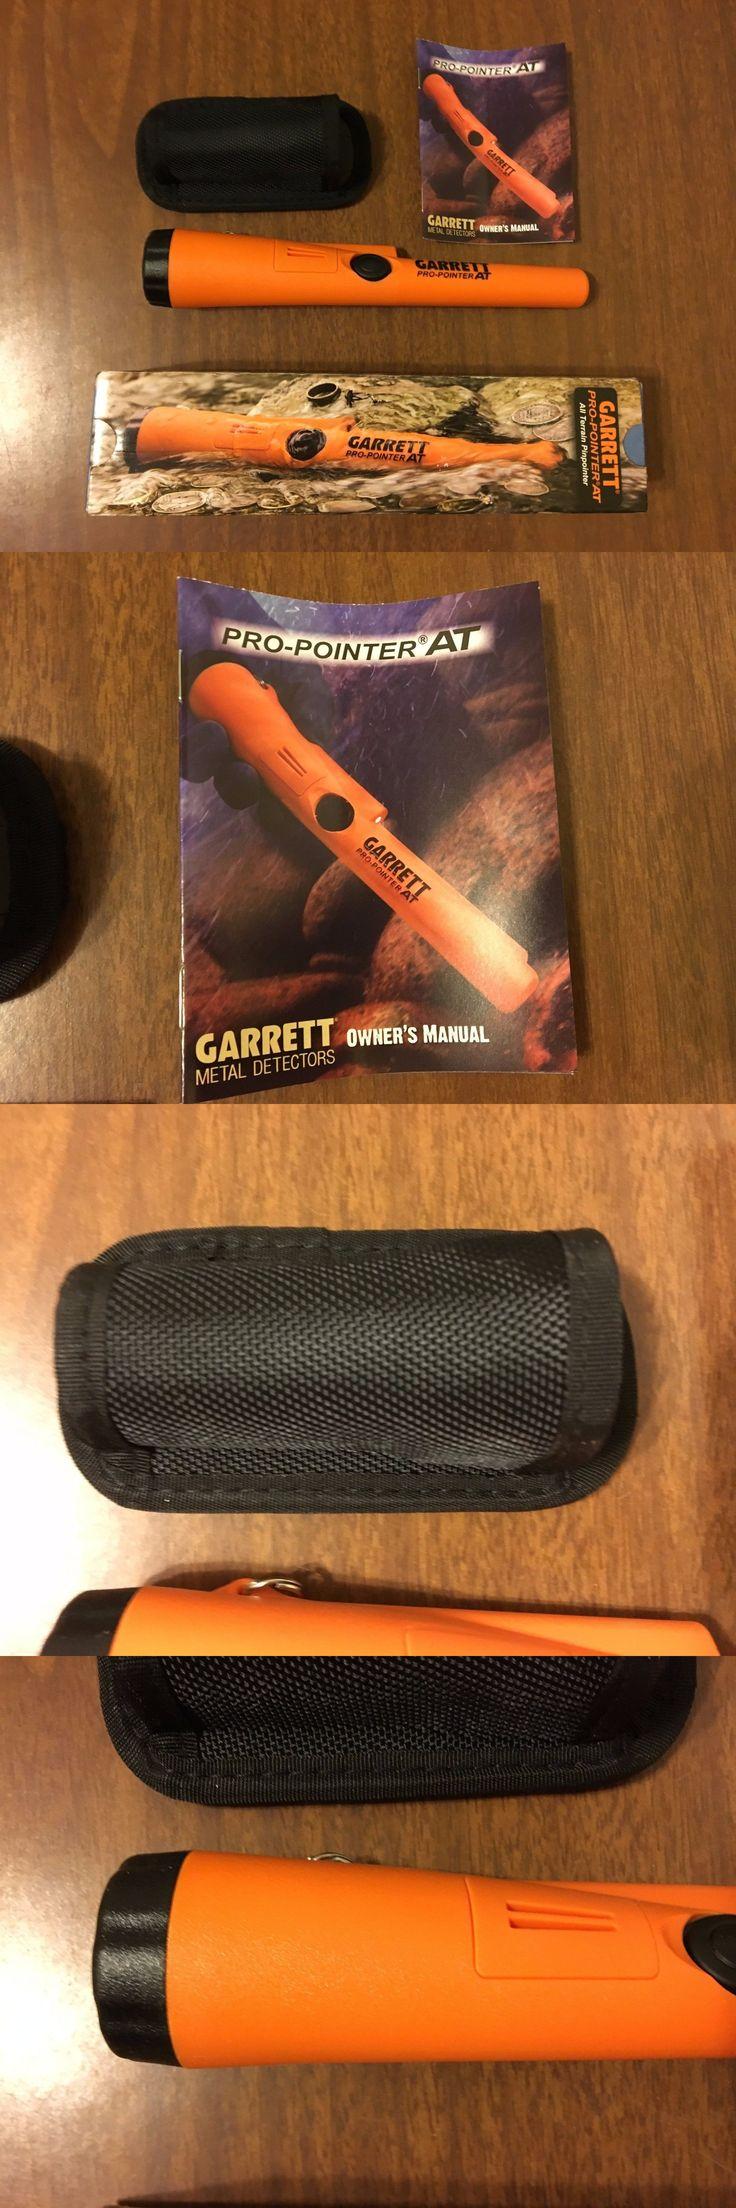 Metal Detectors: New Garrett Metal Detectors Propointer At Pinpointer W/ Holster Waterproof -> BUY IT NOW ONLY: $127.45 on eBay!